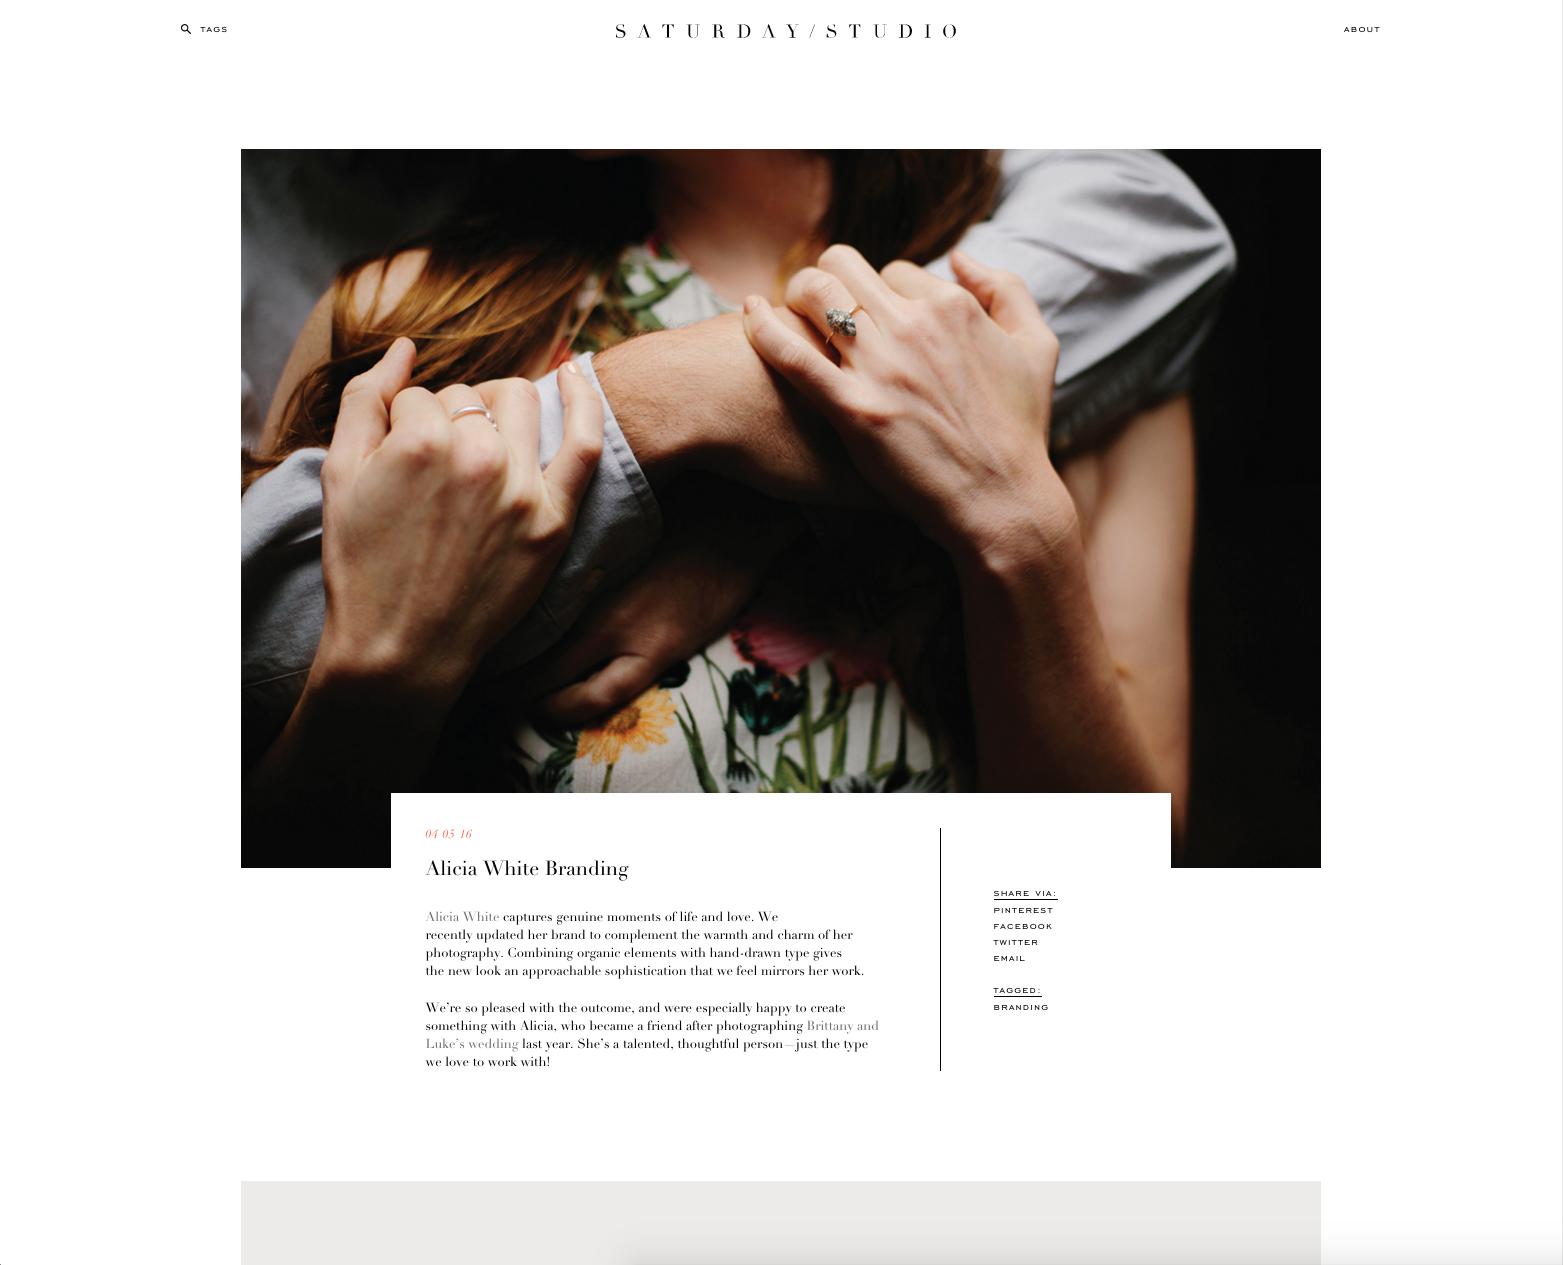 http://www.saturdaystudio.com/2016/04/05/alicia-white-branding/